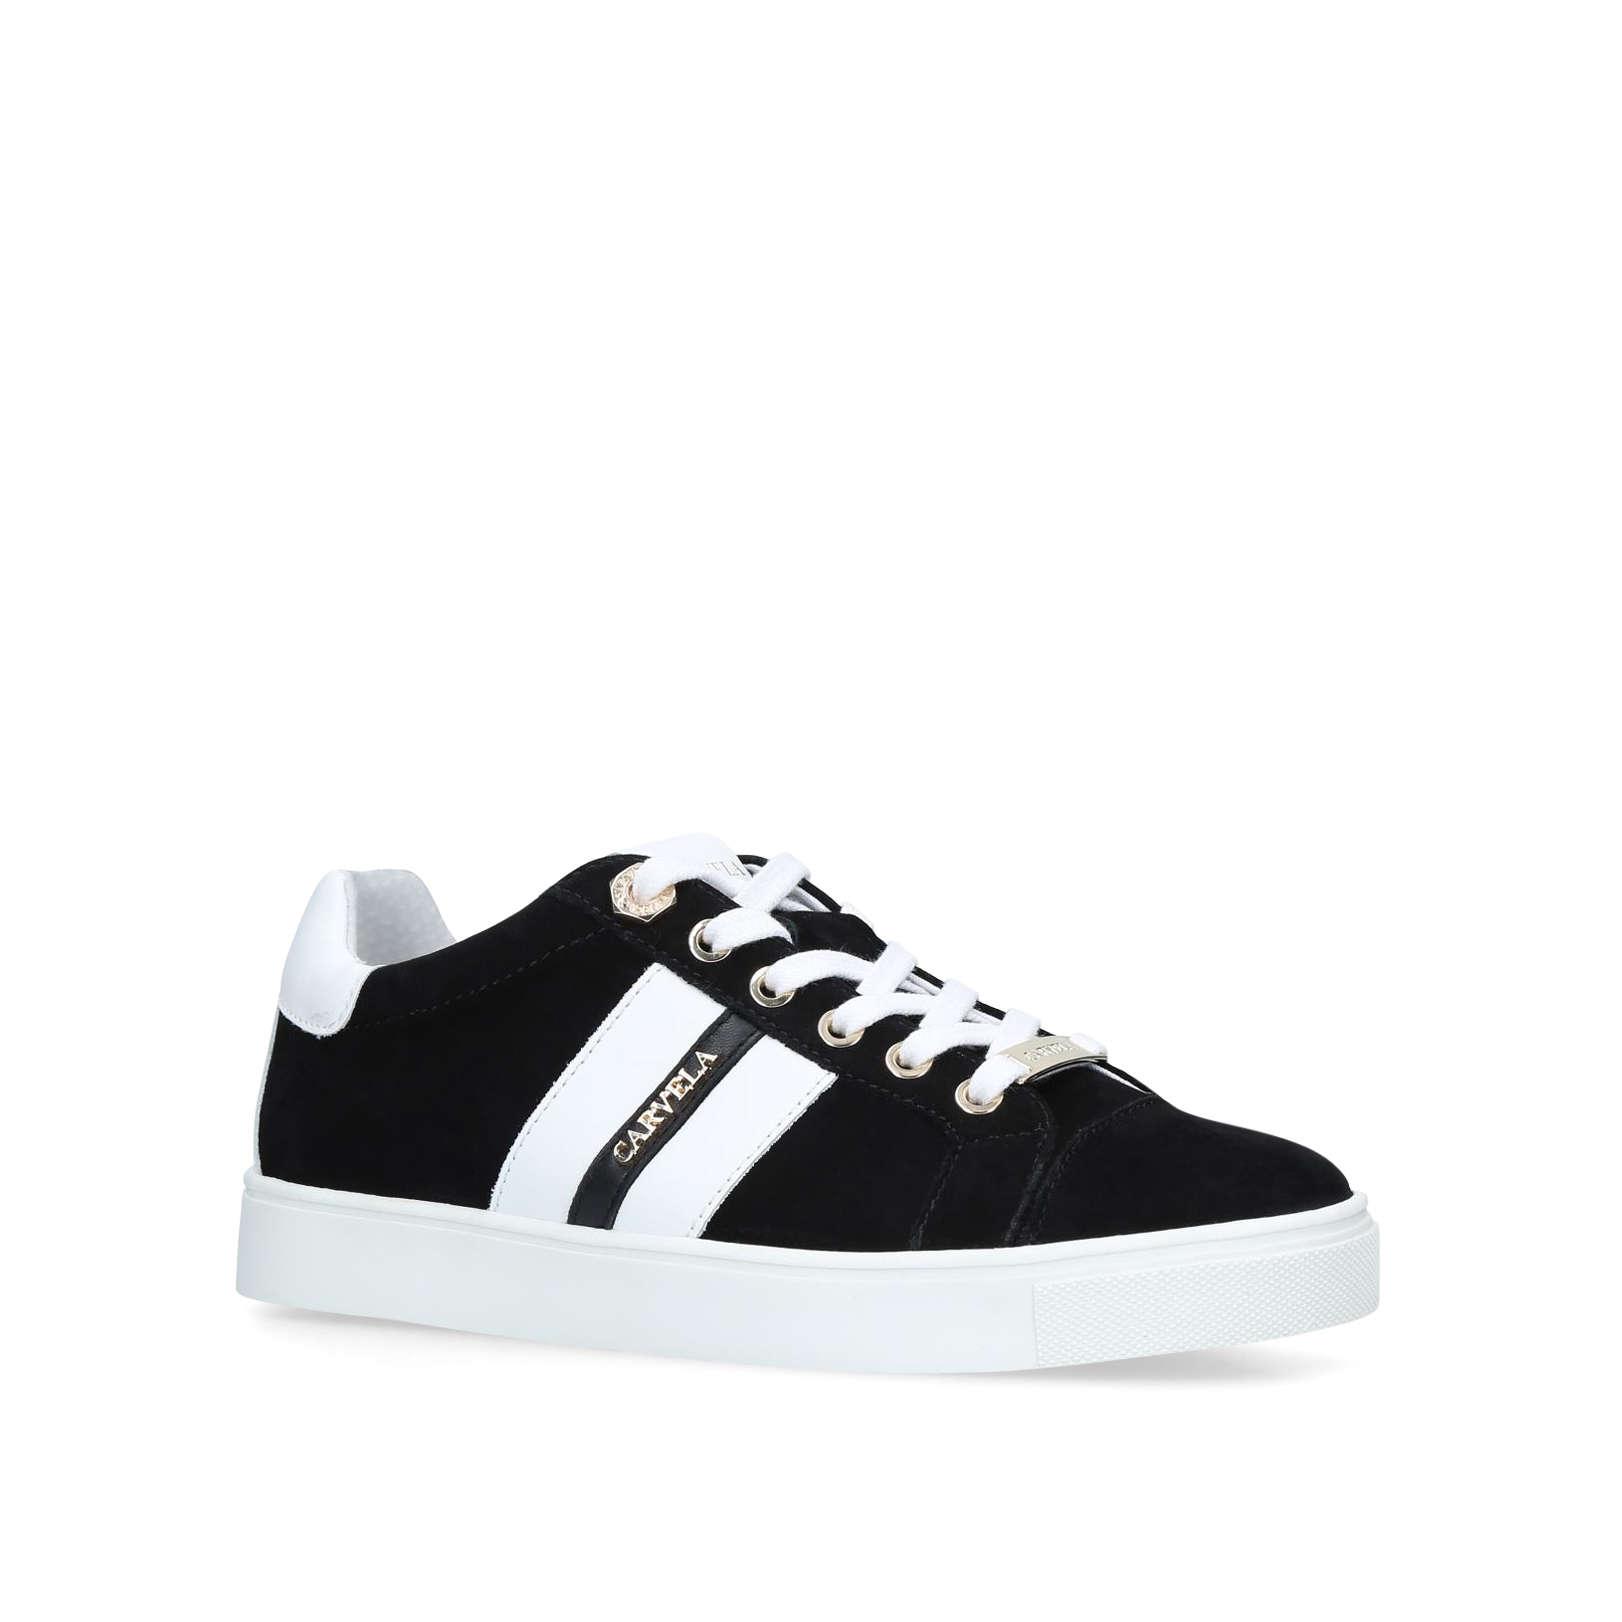 eb15e7b649b3f LISA 2 - CARVELA Sneakers